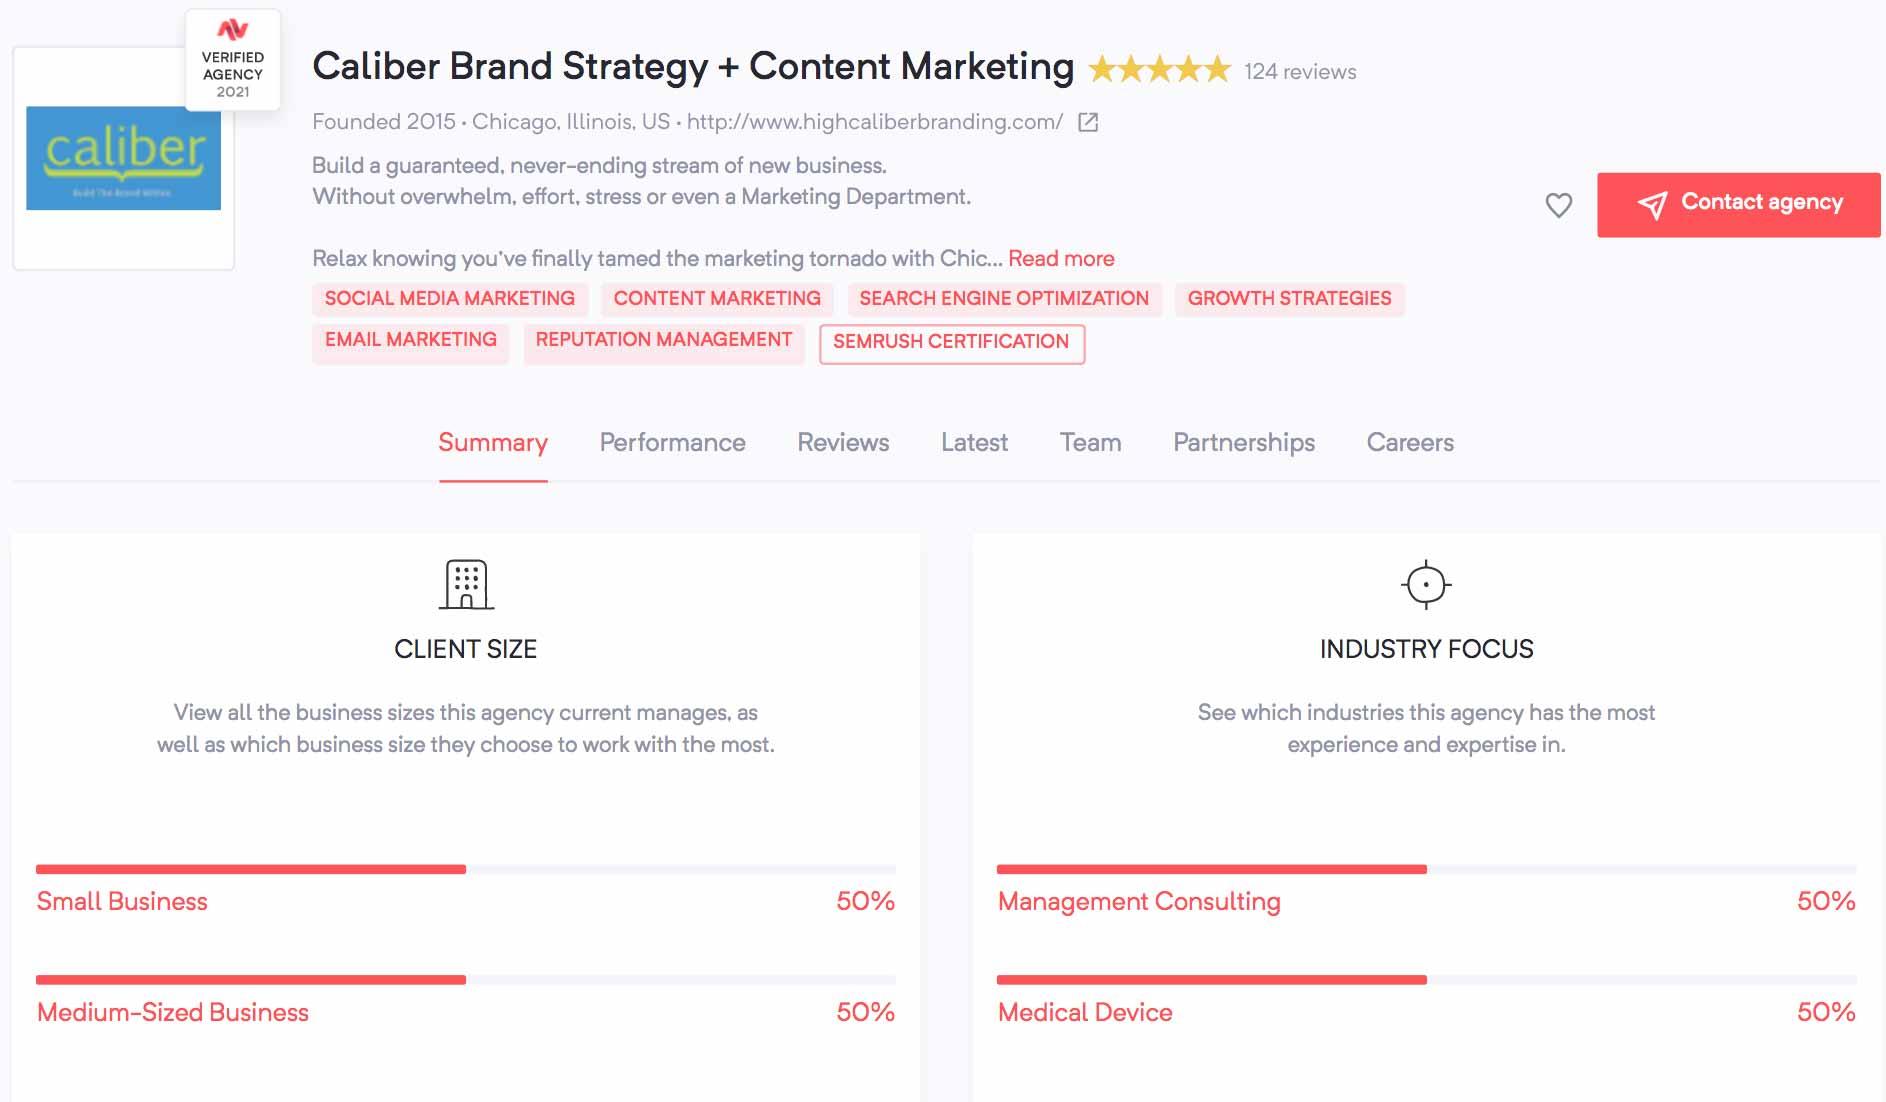 Caliber Brand Strategy + Content Marketing | Agency Vista